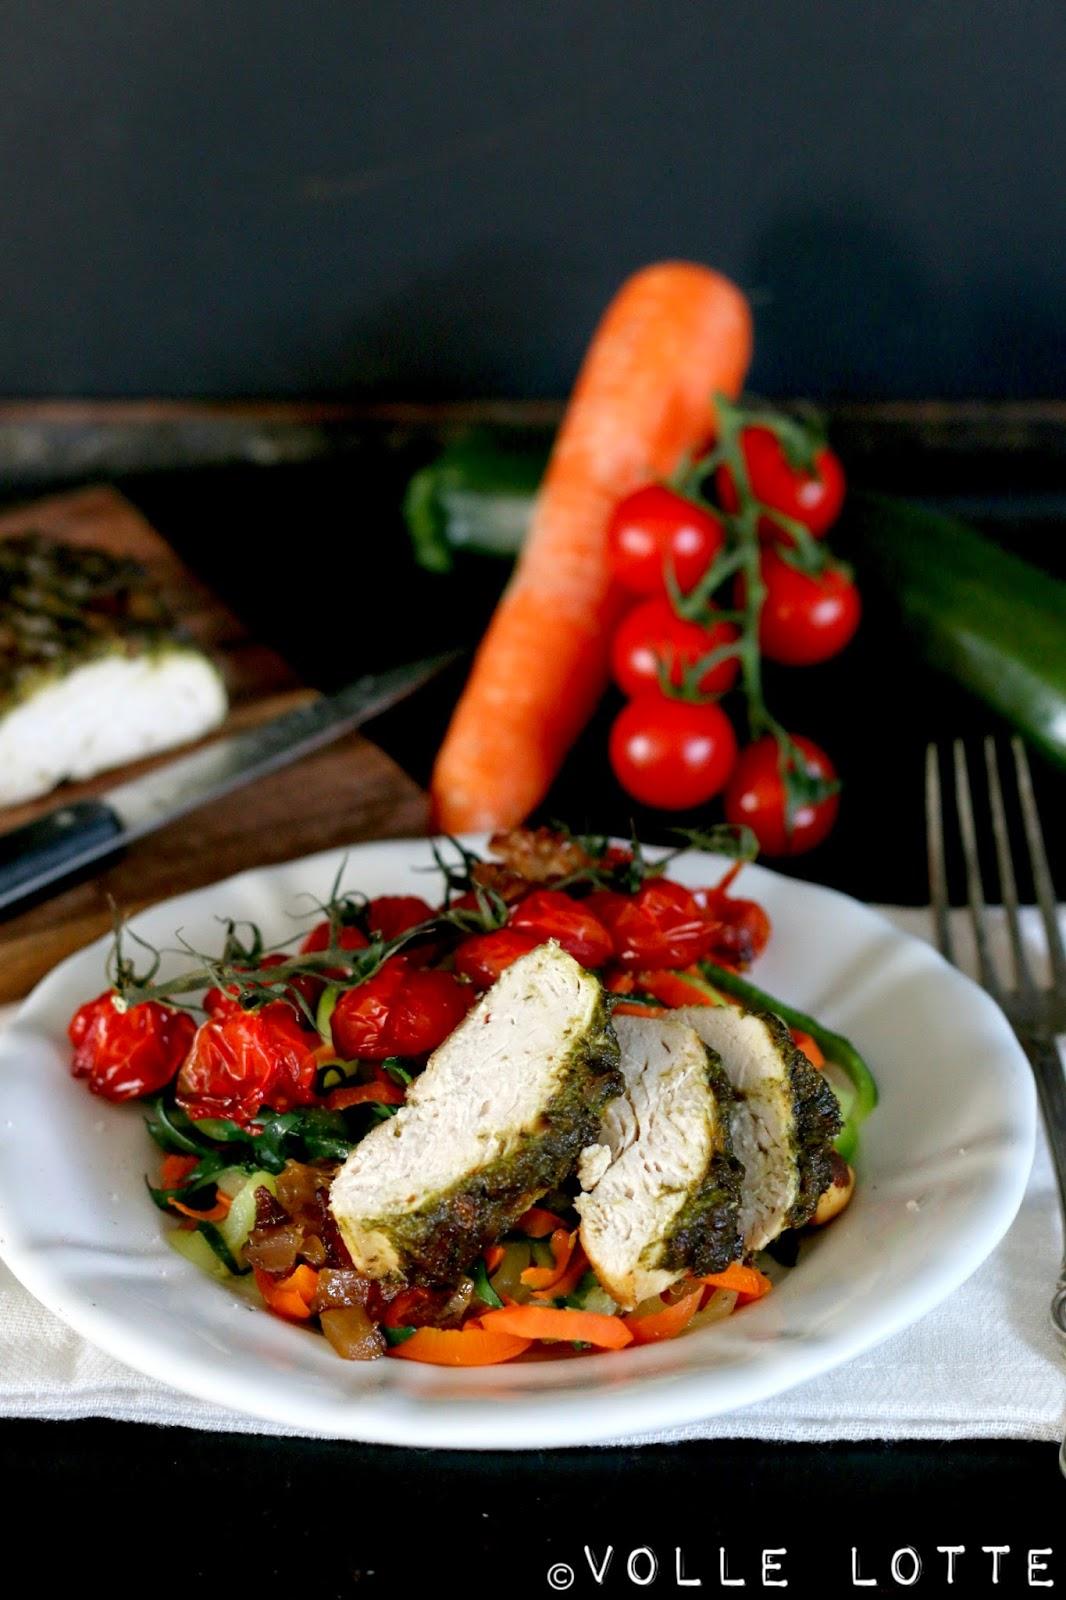 Pesto, Hähnchen, Tomate, Spaghetti, Dishstorm, Pestogate, Pestostorm